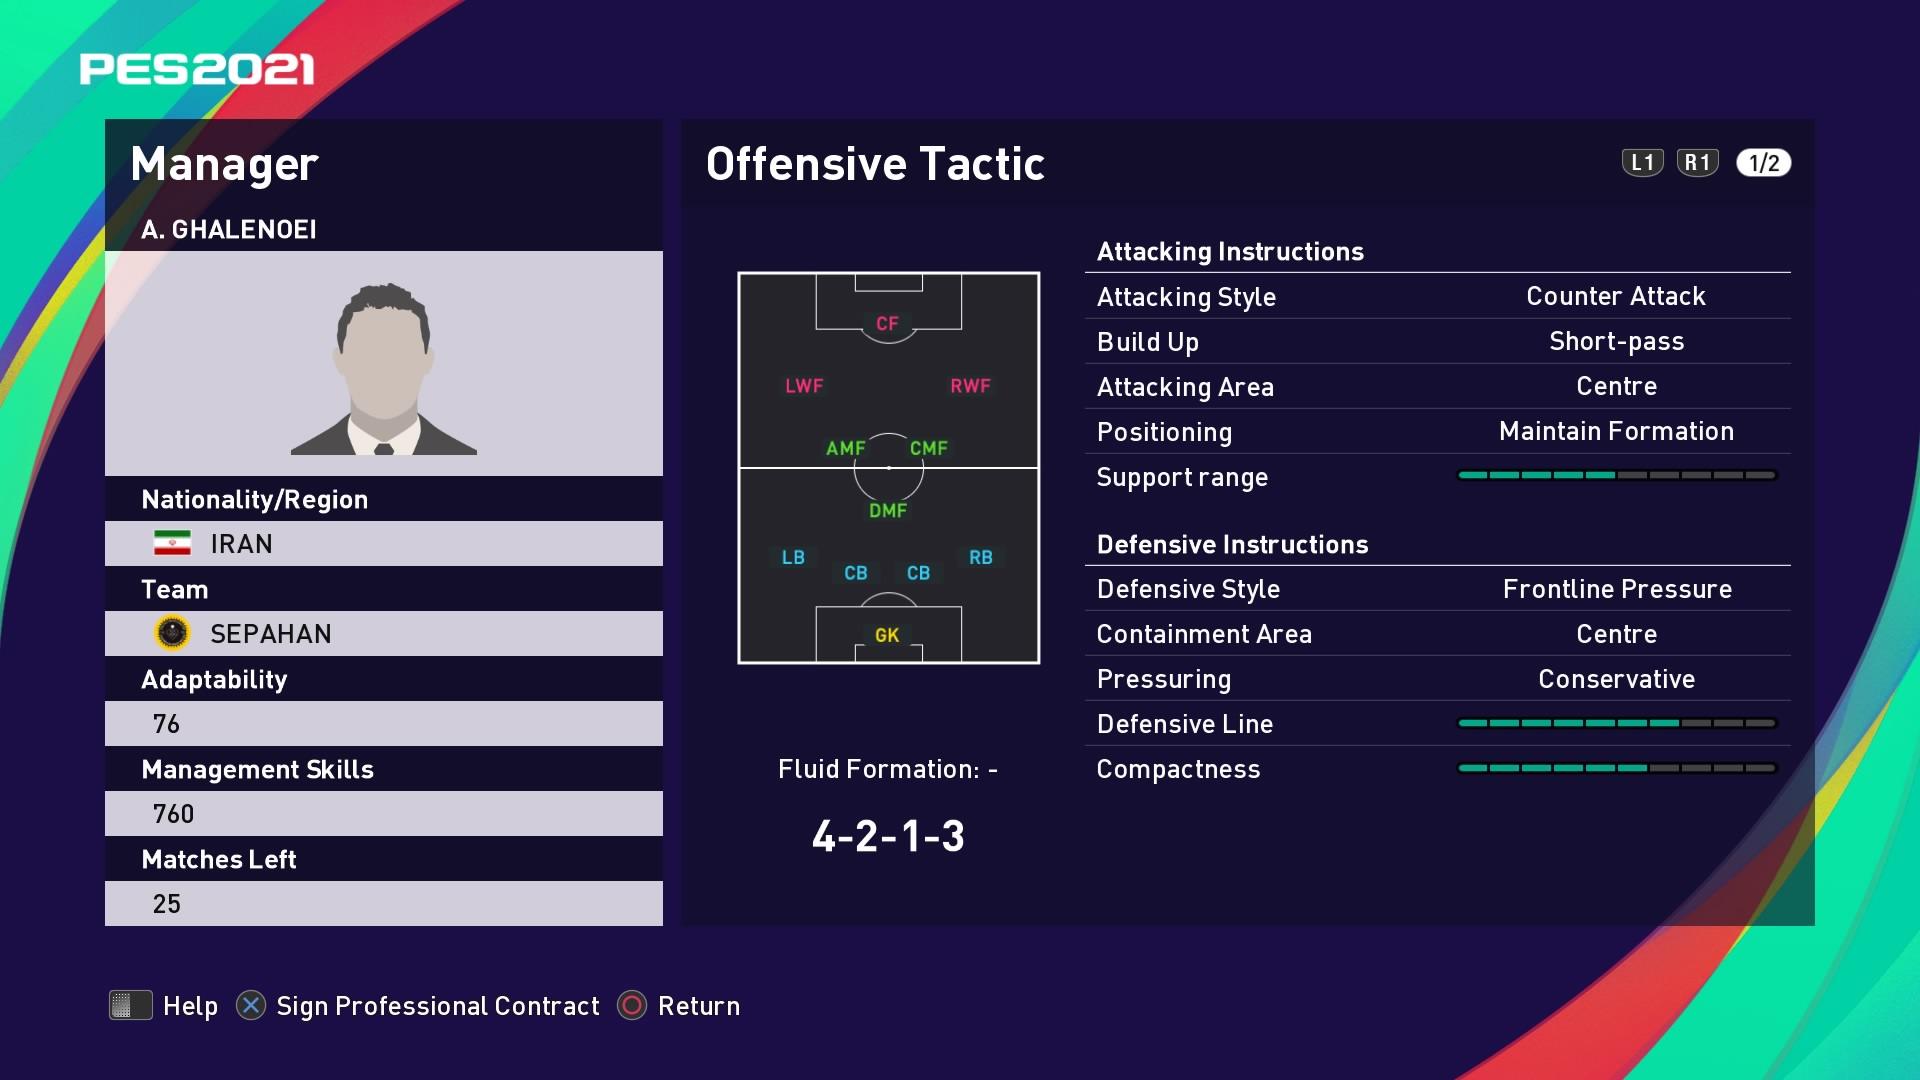 A. Ghalenoei (Amir Ghalenoei) Offensive Tactic in PES 2021 myClub